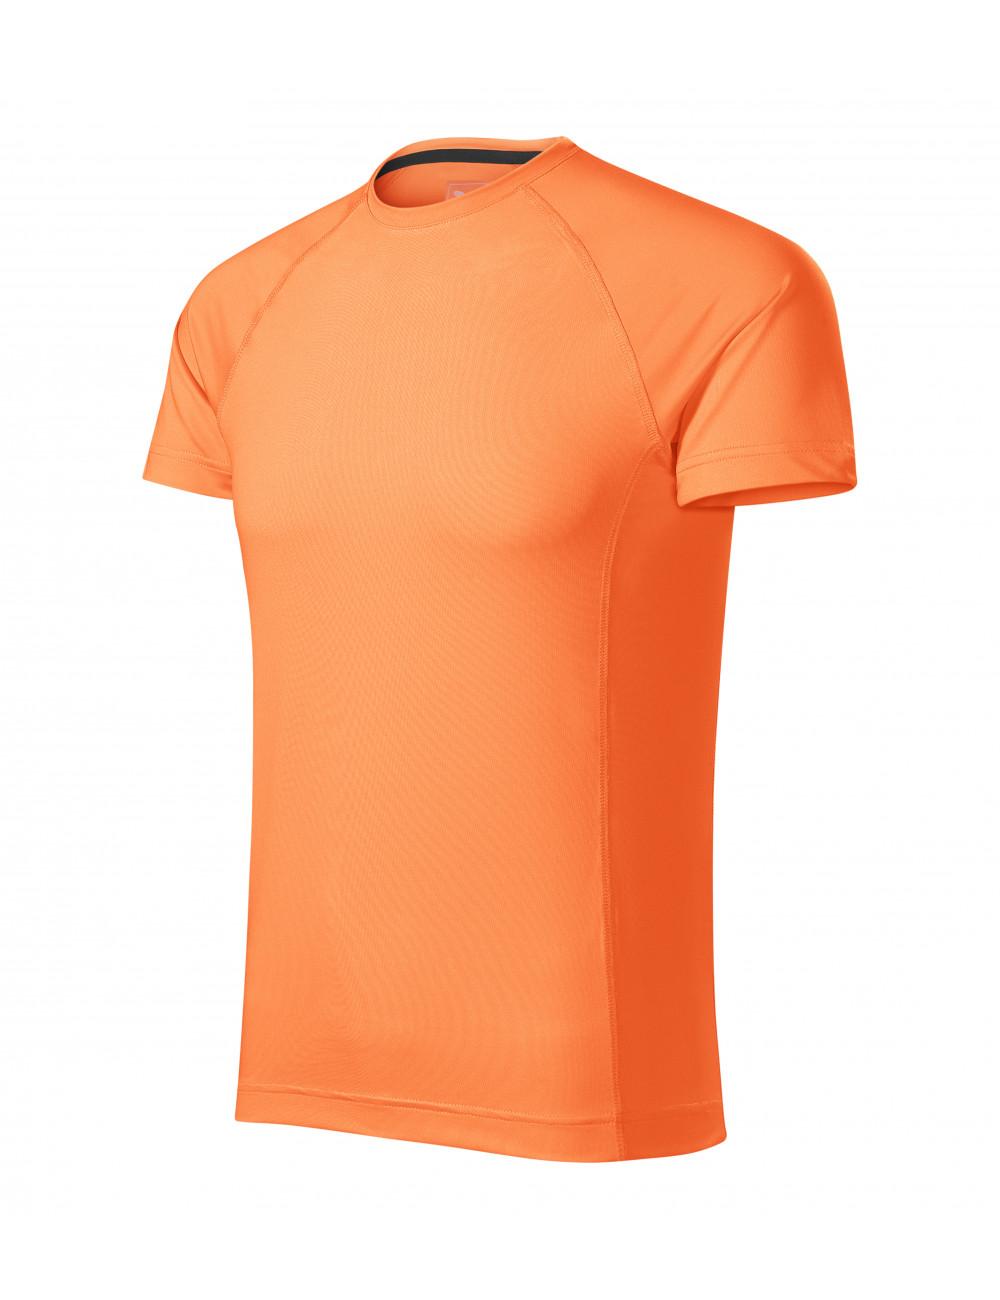 Adler MALFINI Koszulka męska Destiny 175 neon mandarine